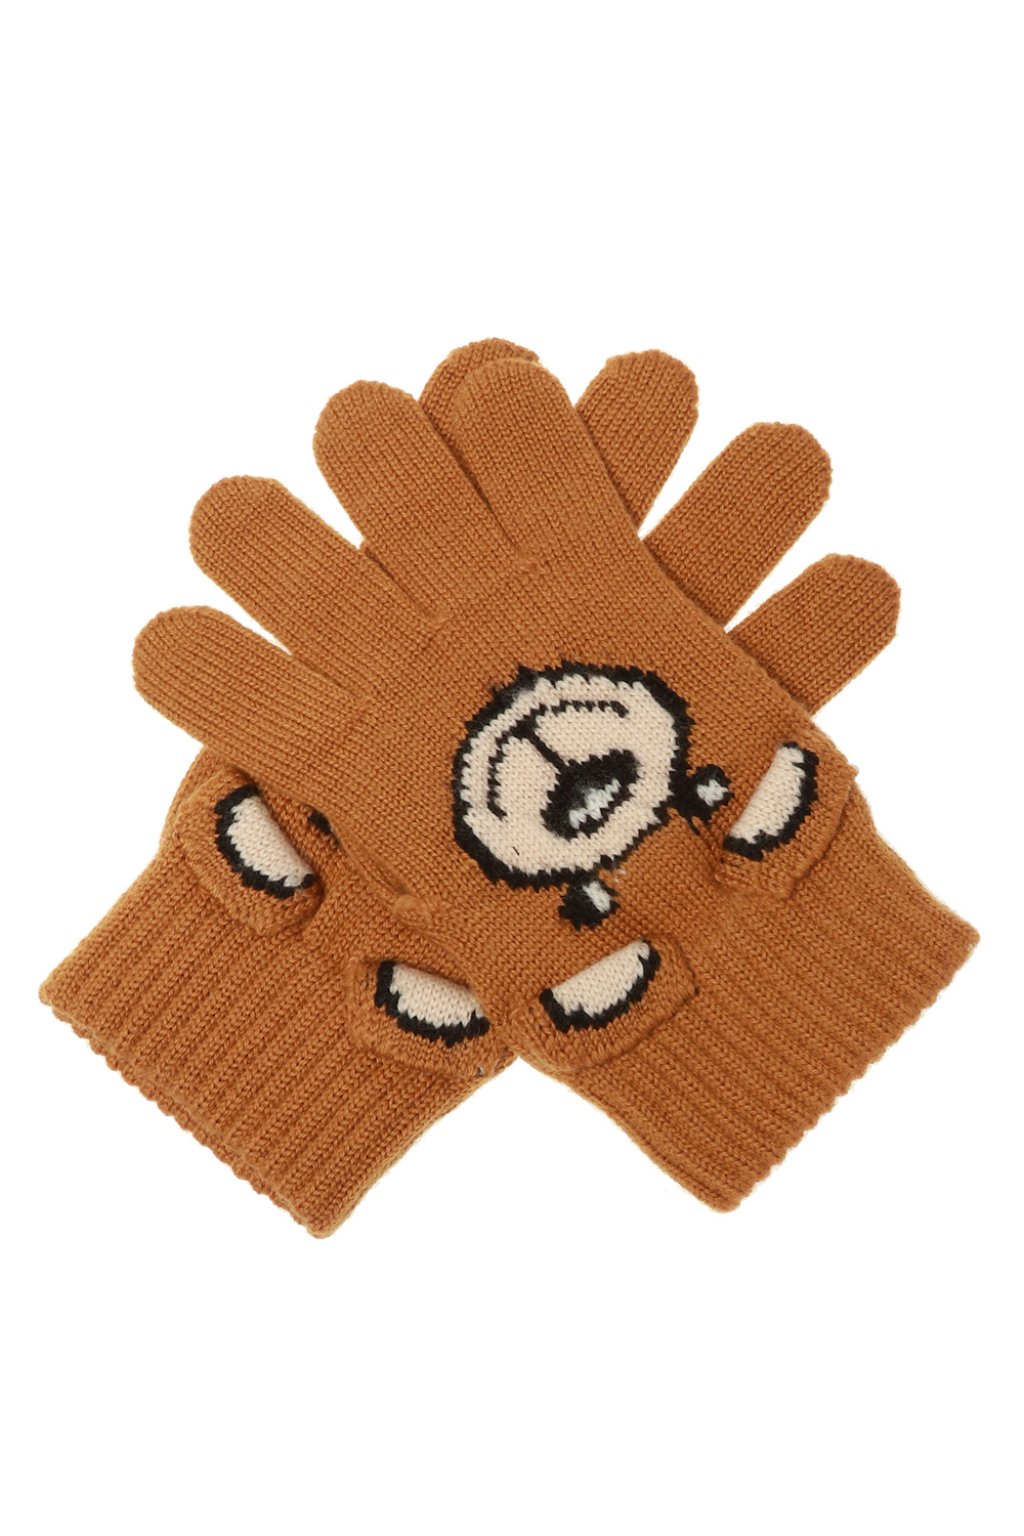 Moschino Teddy bear gloves